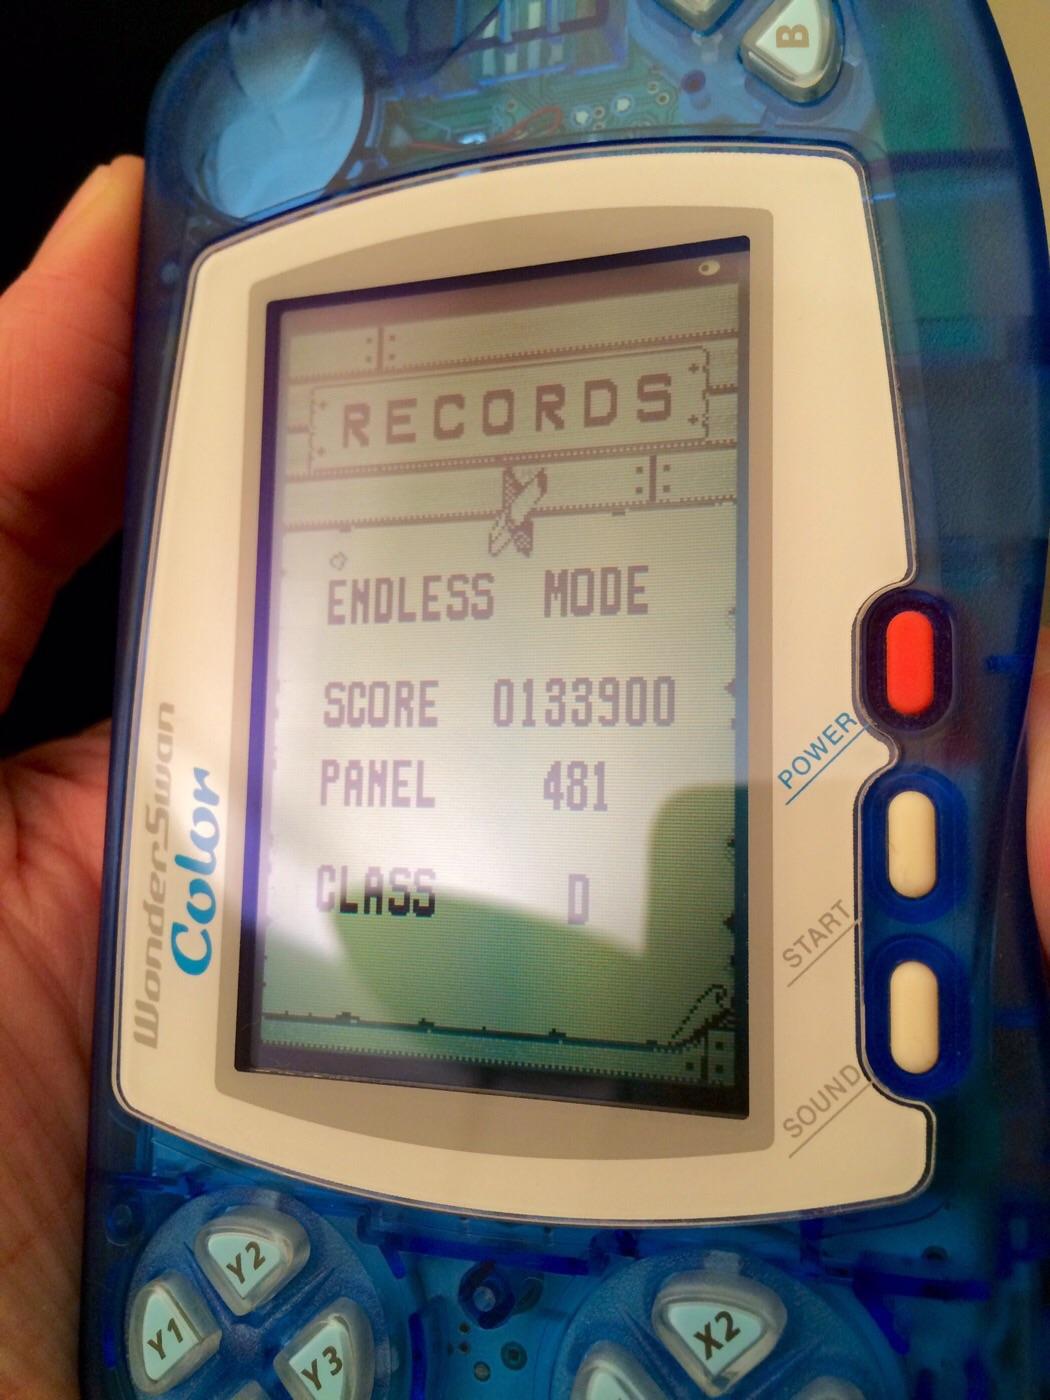 SHiNjide: GunPey [Endless Mode] (Wonderswan) 133,900 points on 2014-12-24 13:03:40